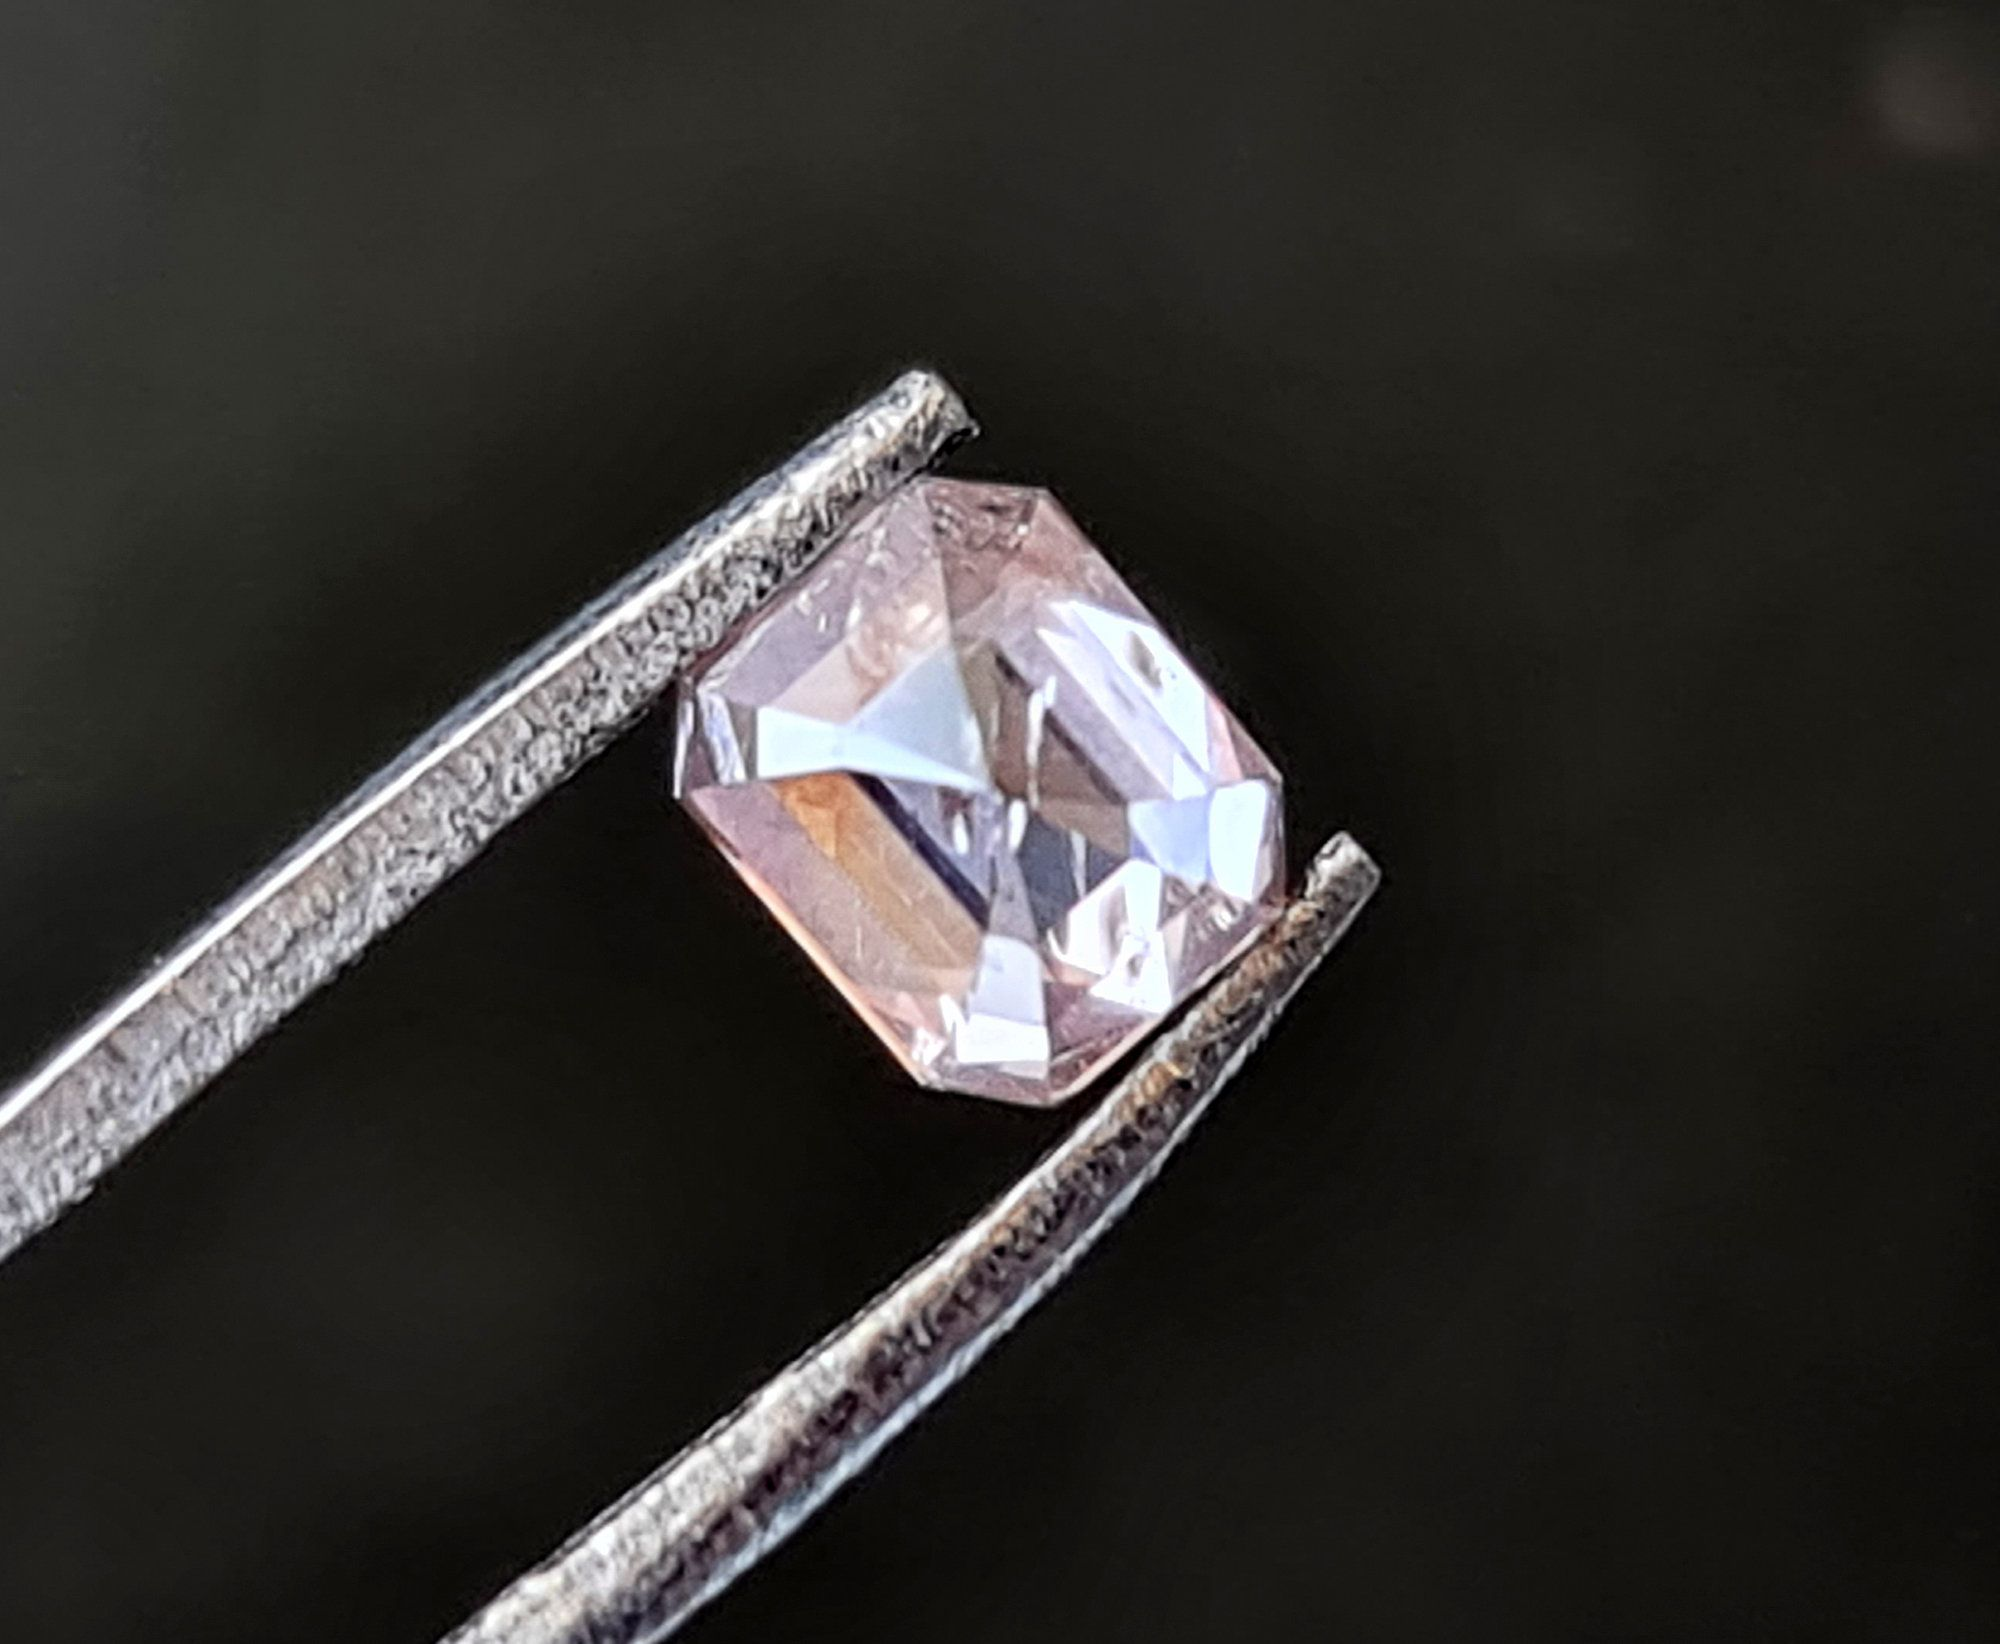 5mm Approx Gemstone For Jewelry Emerald Plain Box Shape Briolettes 16 Inch Strand Full Strand Emerald Box Shape Beads